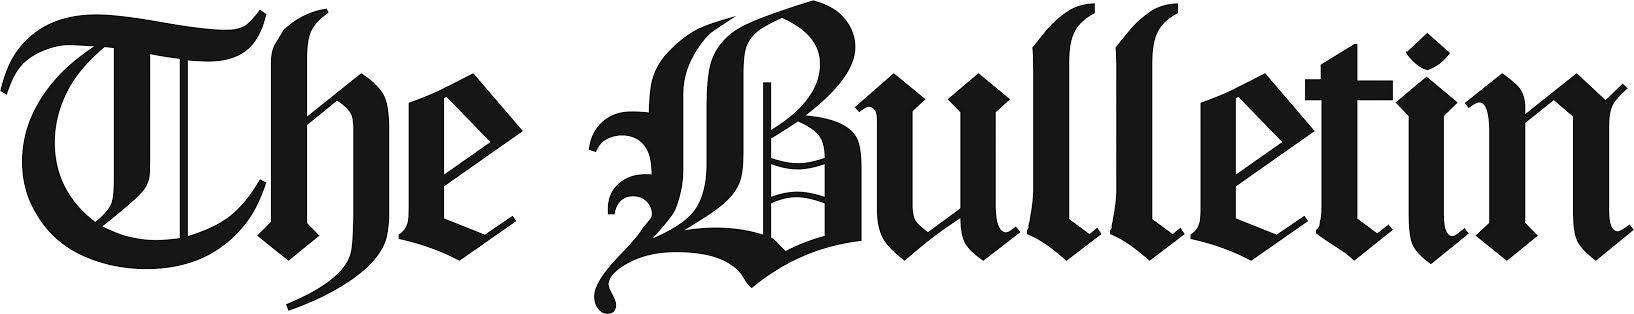 The Norwich Bulletin